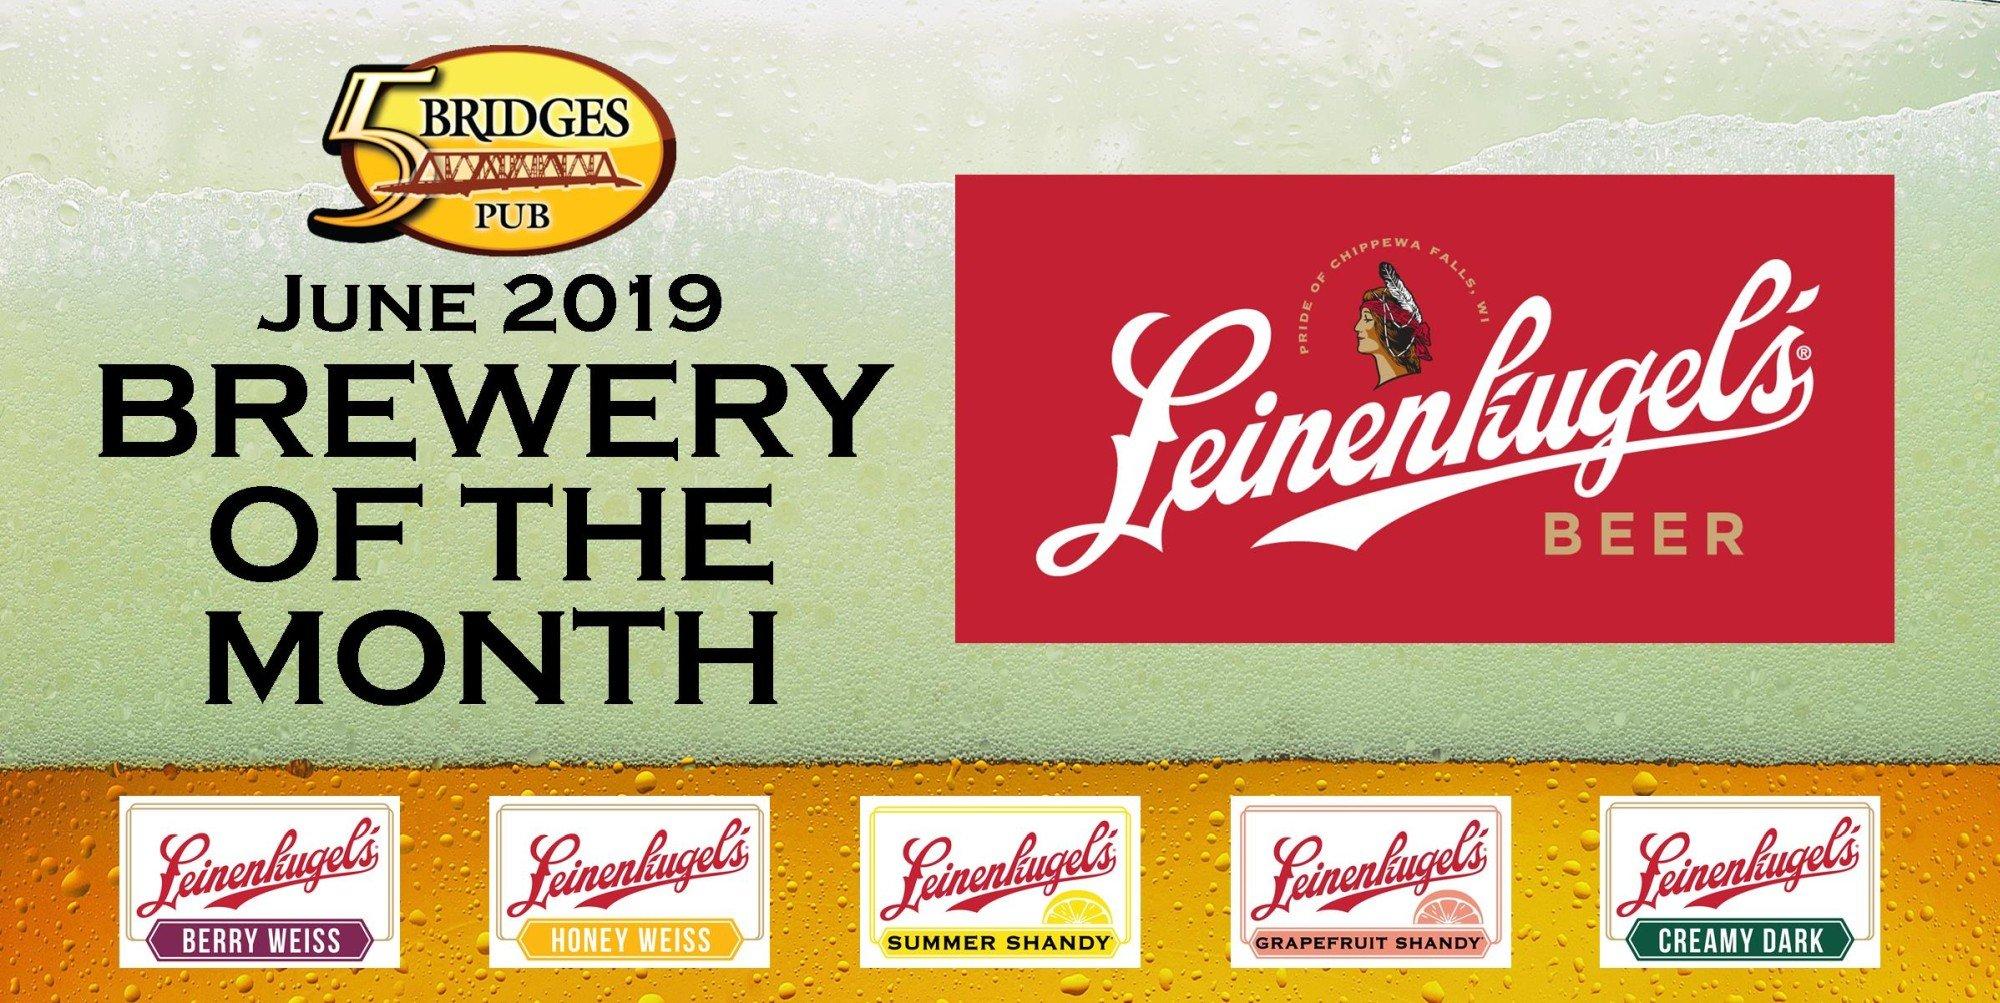 June 2019 Brewery of the Month – Leinenkugel's